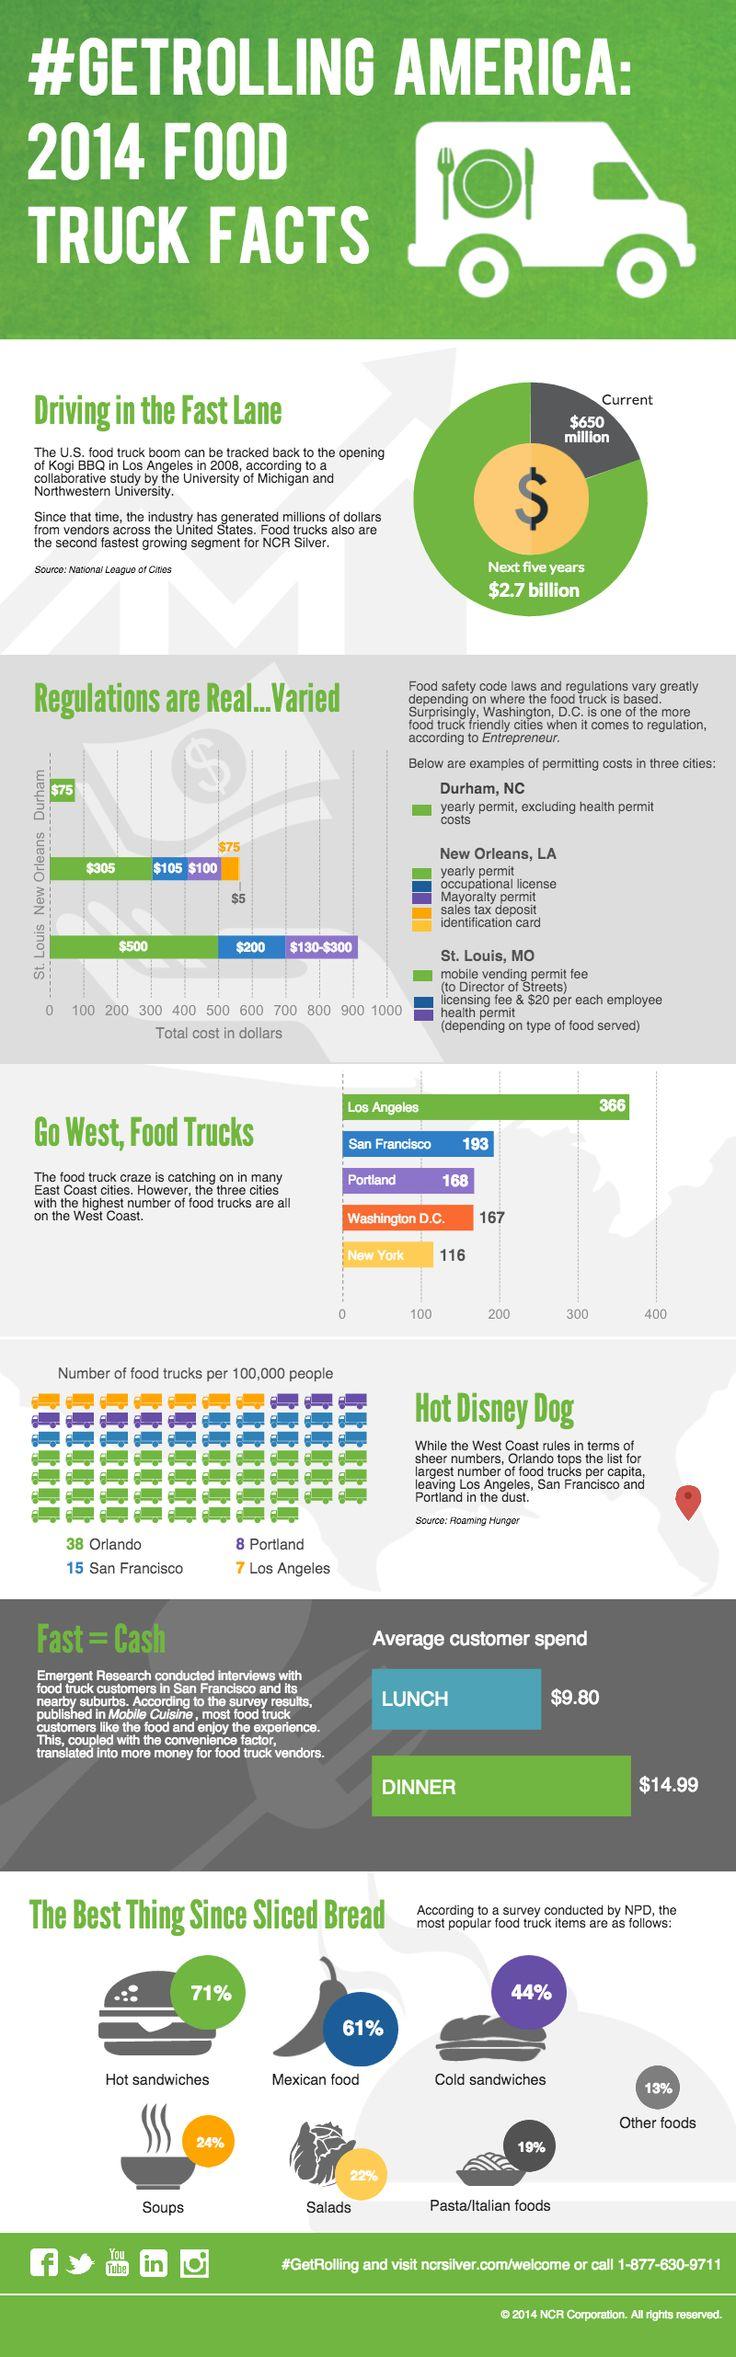 130 Best Food Truck Images On Pinterest